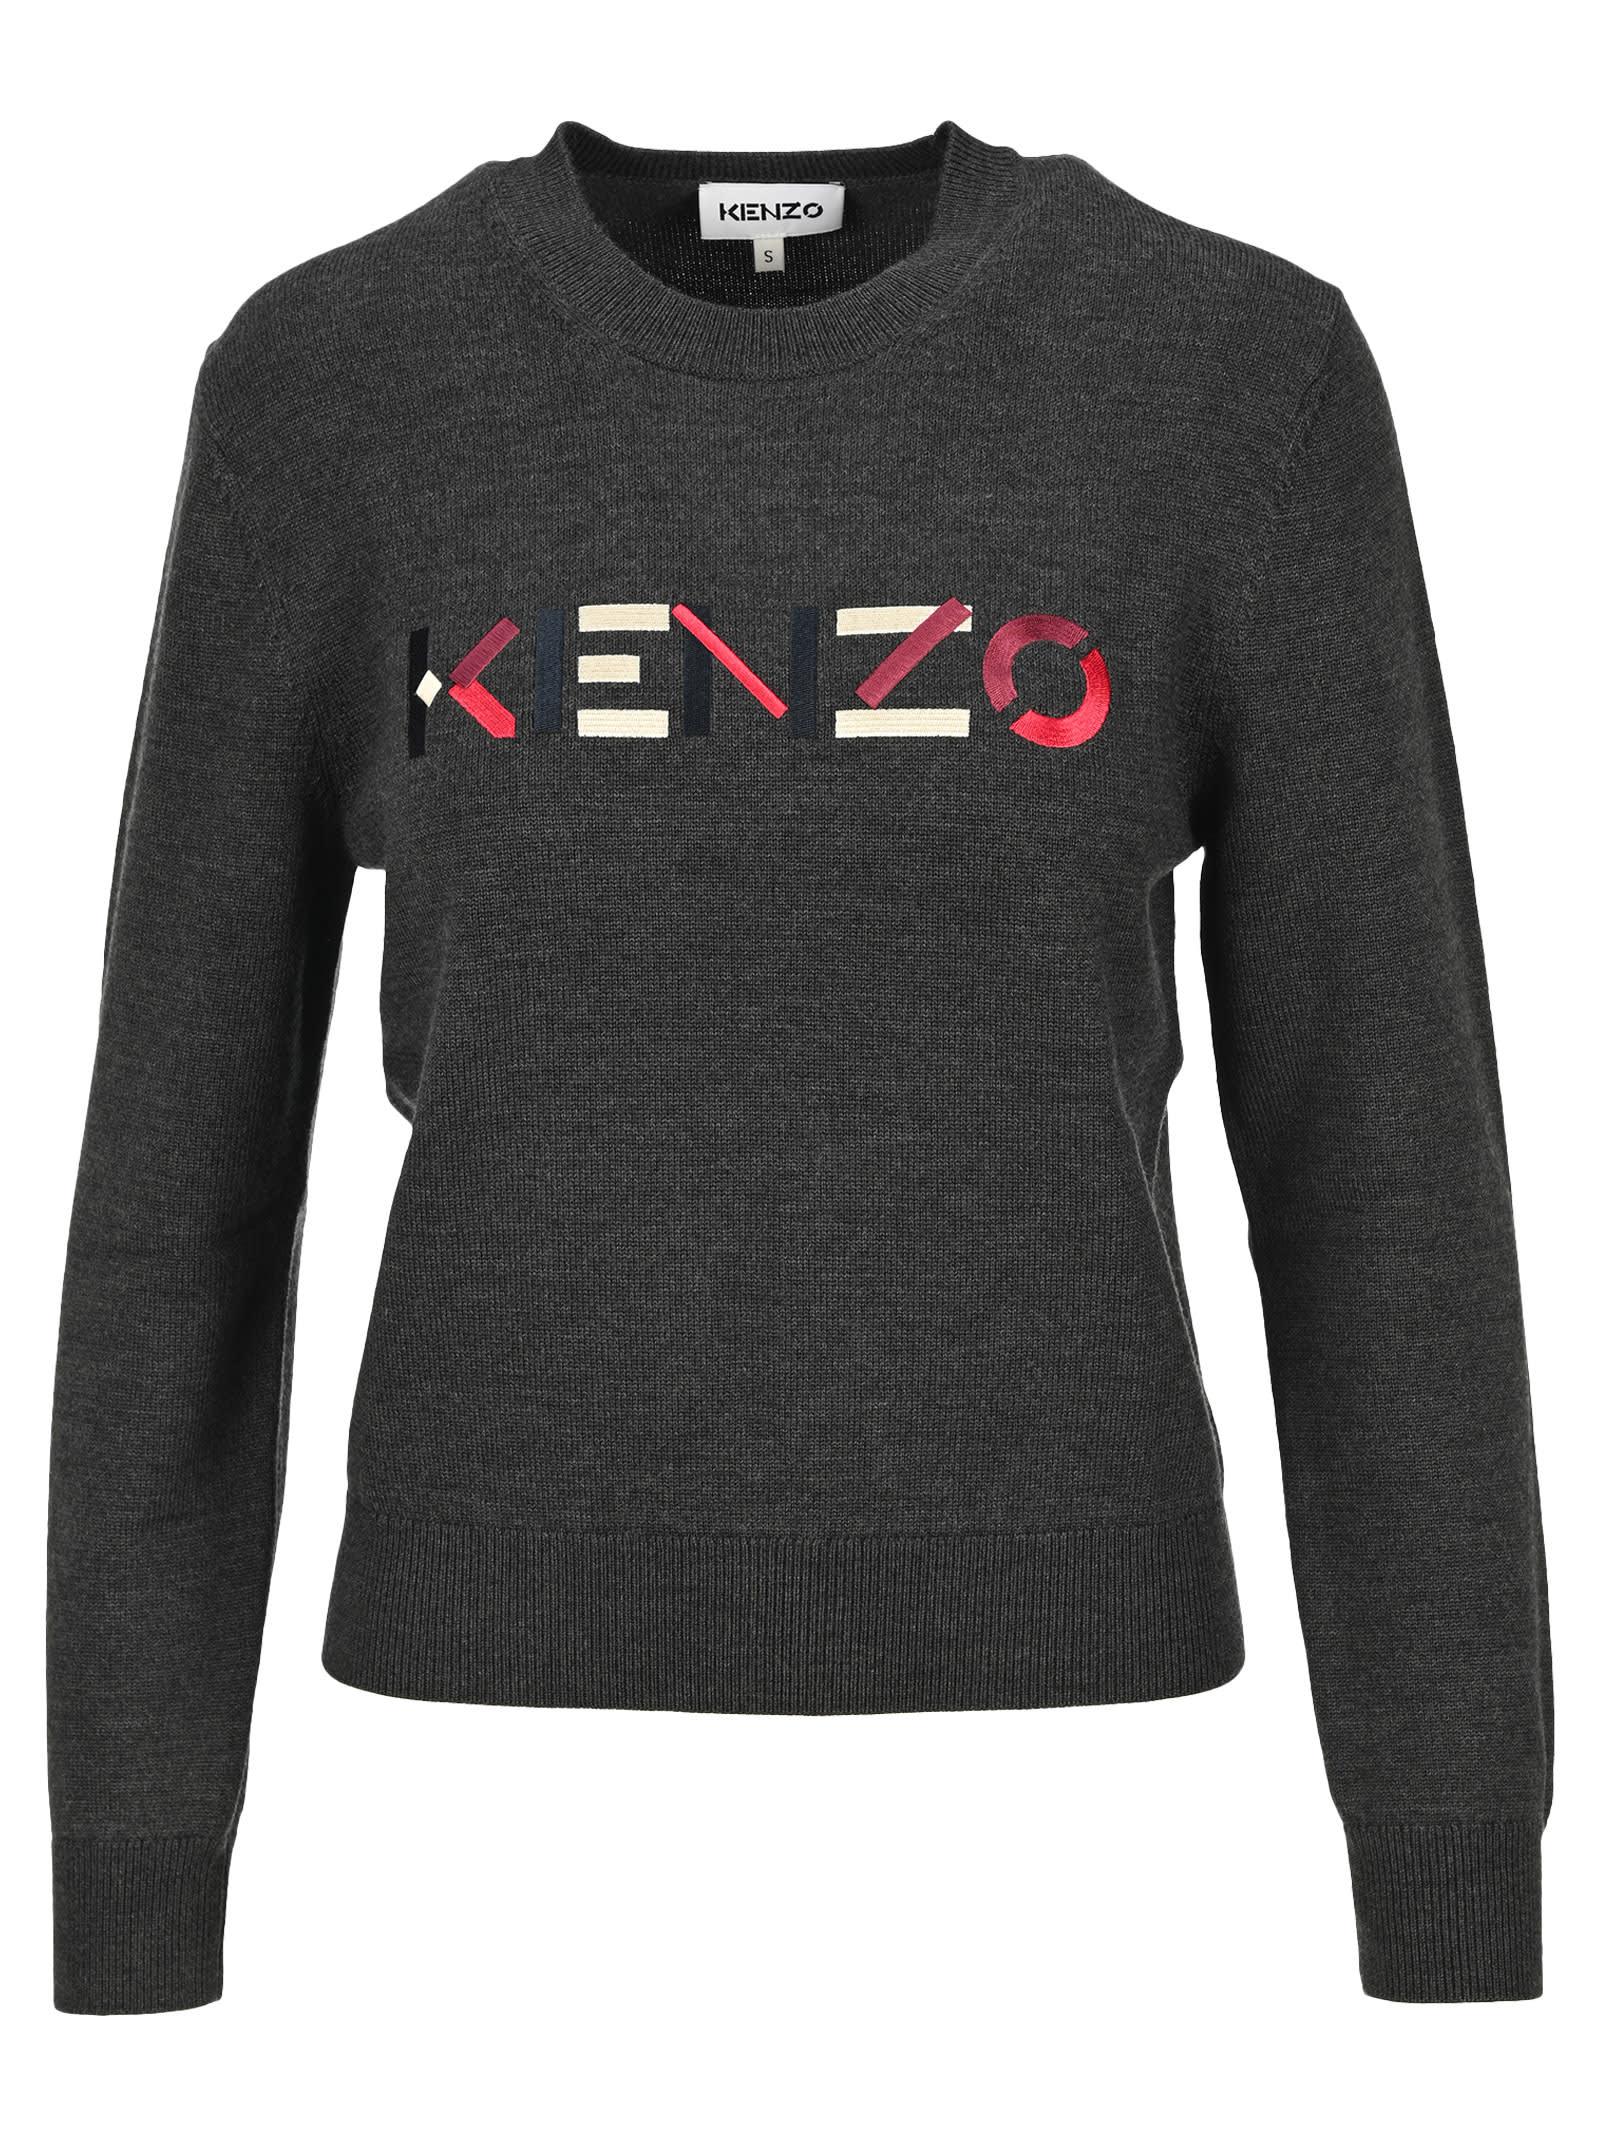 Kenzo Kenzo Logo Multicoloured Jumper